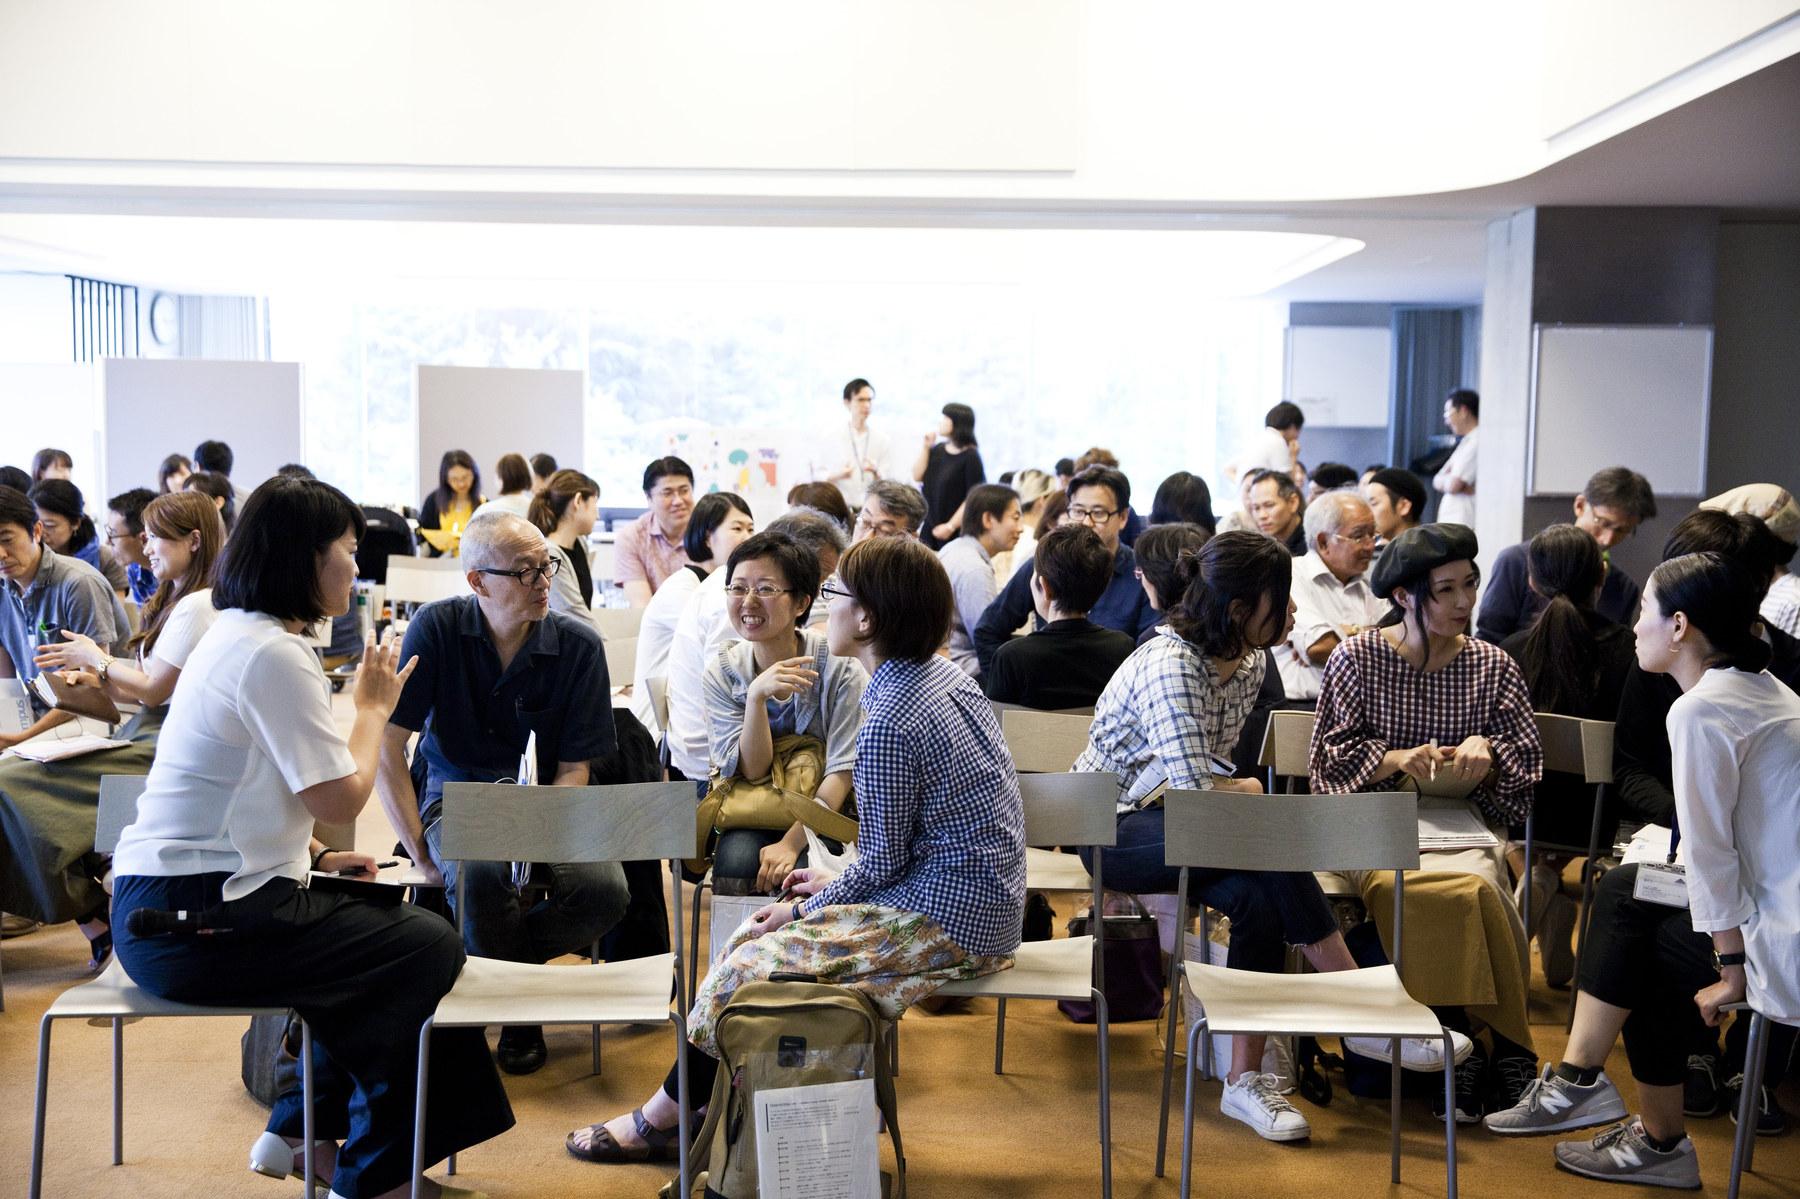 Artpoint Meetingには毎回70名以上の人が参加。東京アートポイント計画のスタッフも参加者やゲストと一緒になって対話する機会になるよう、企画している。